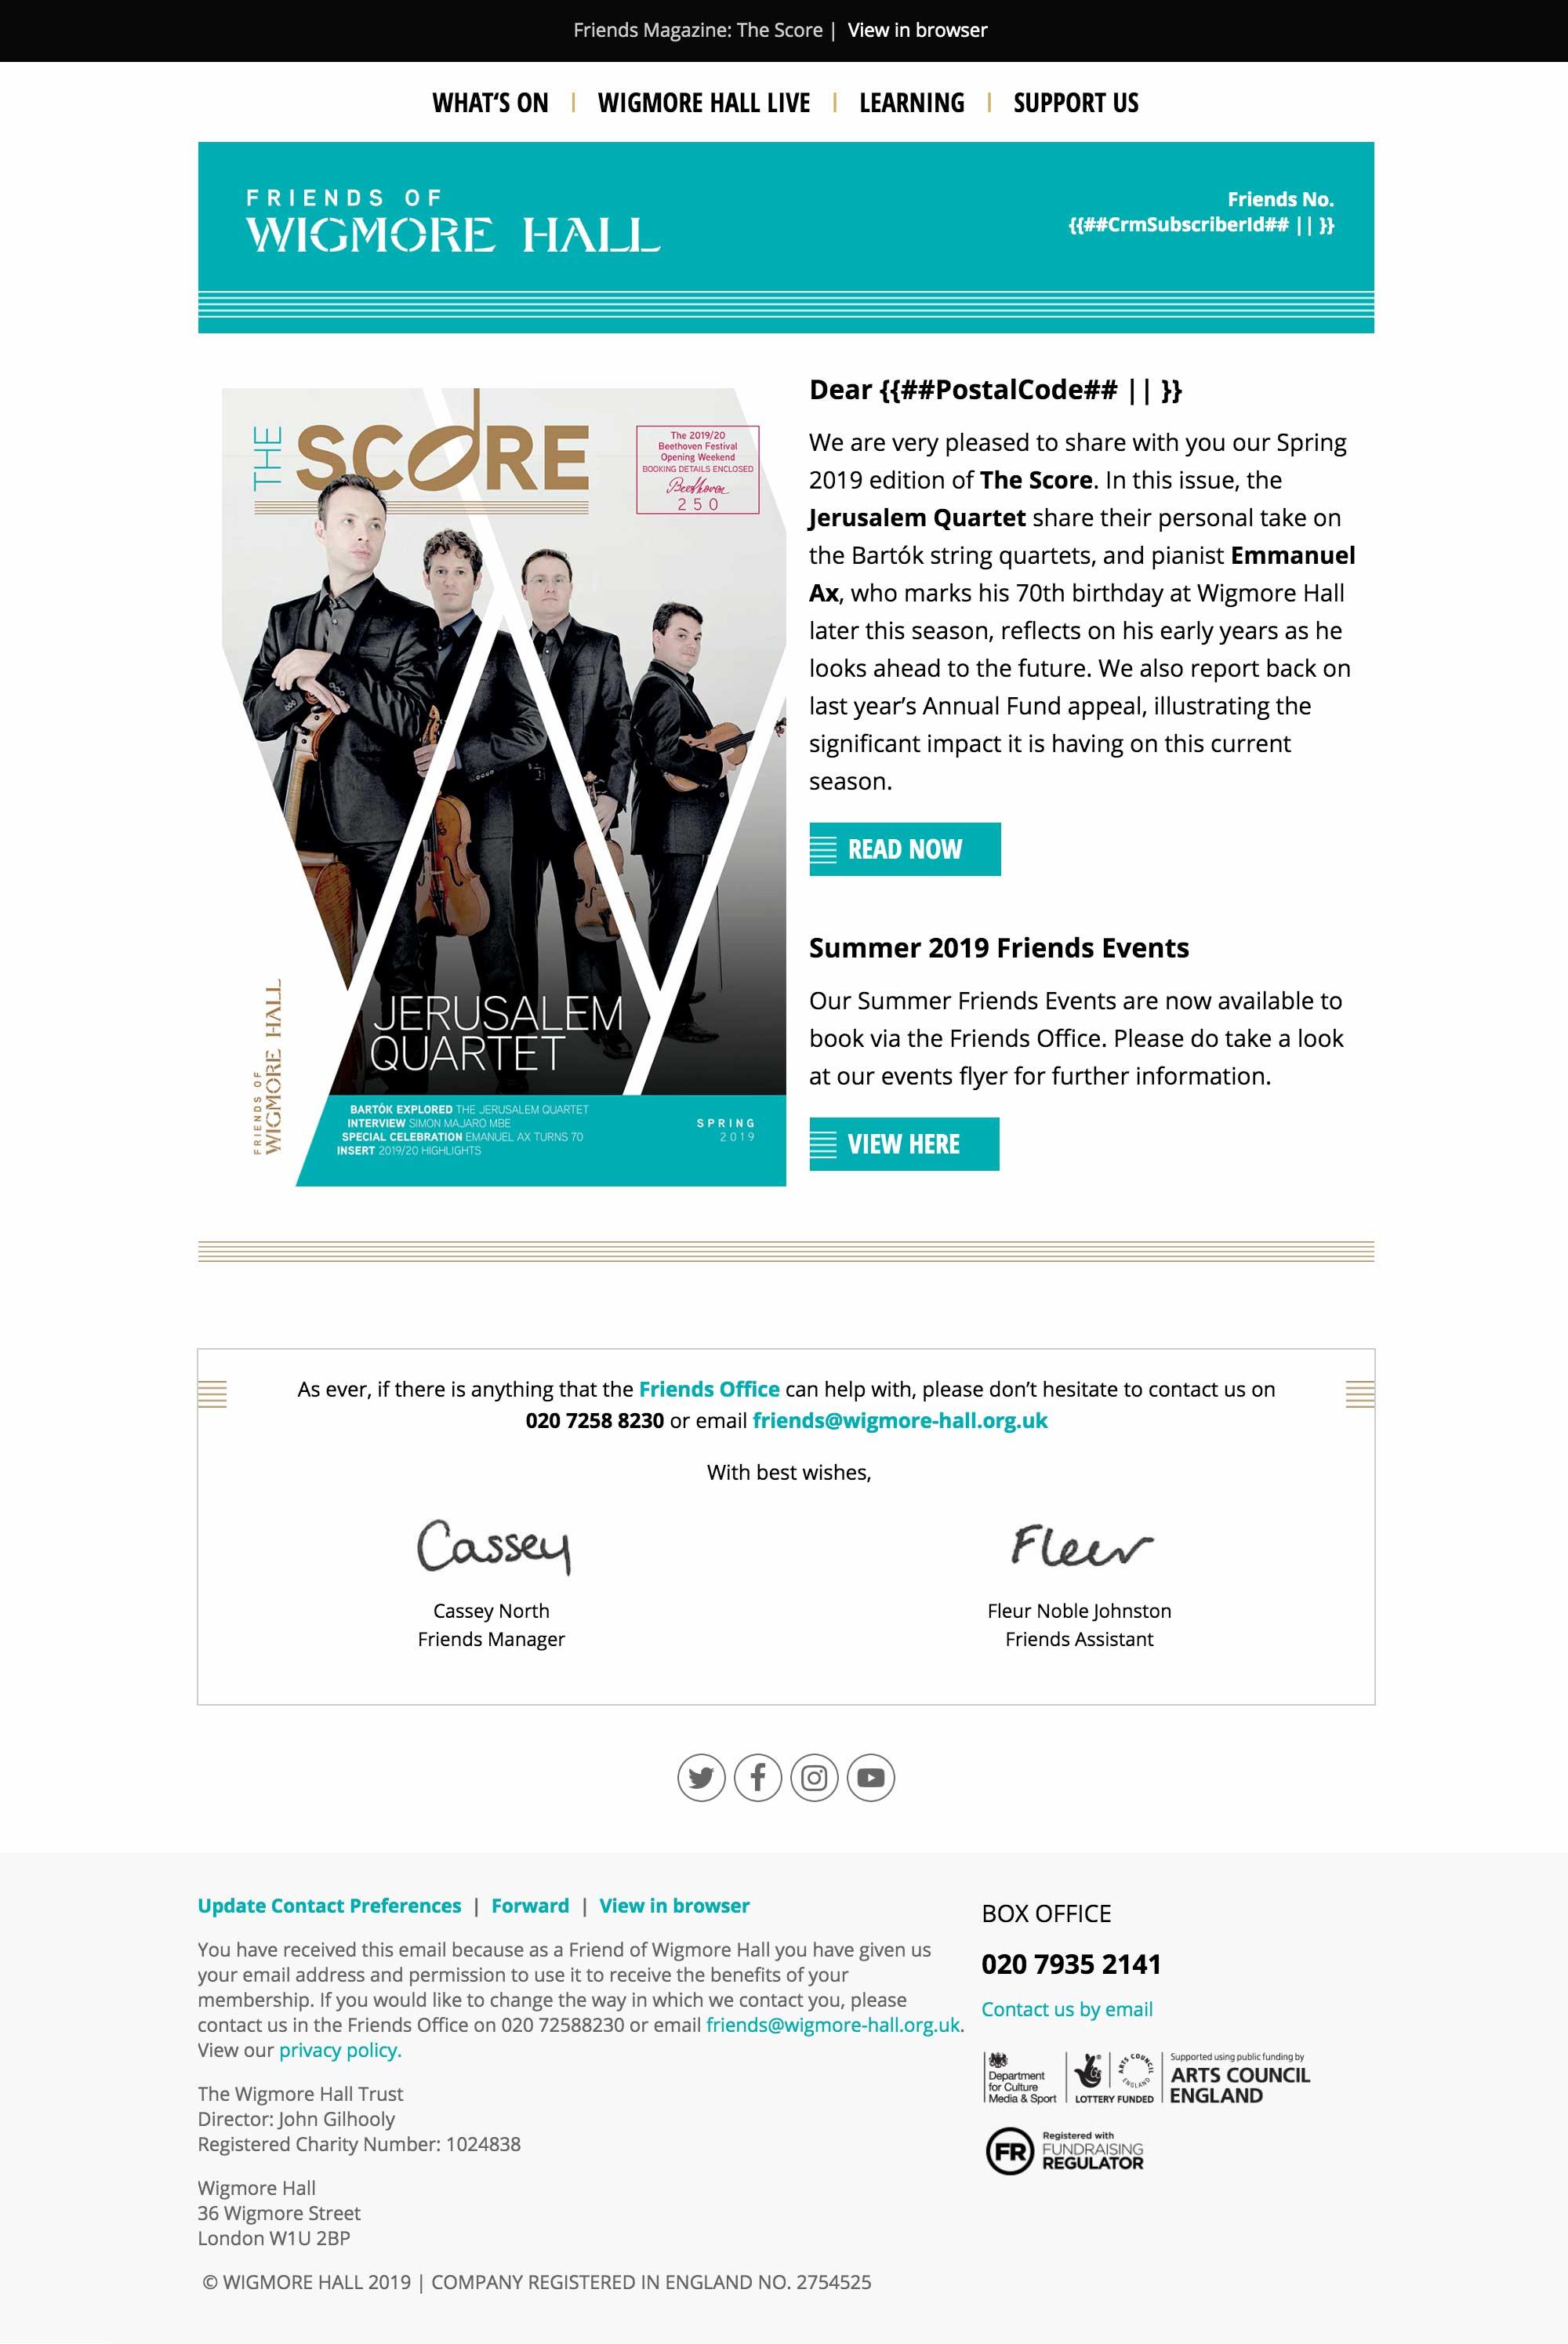 Friends Magazine: The Score - Spring 2019 - desktop view